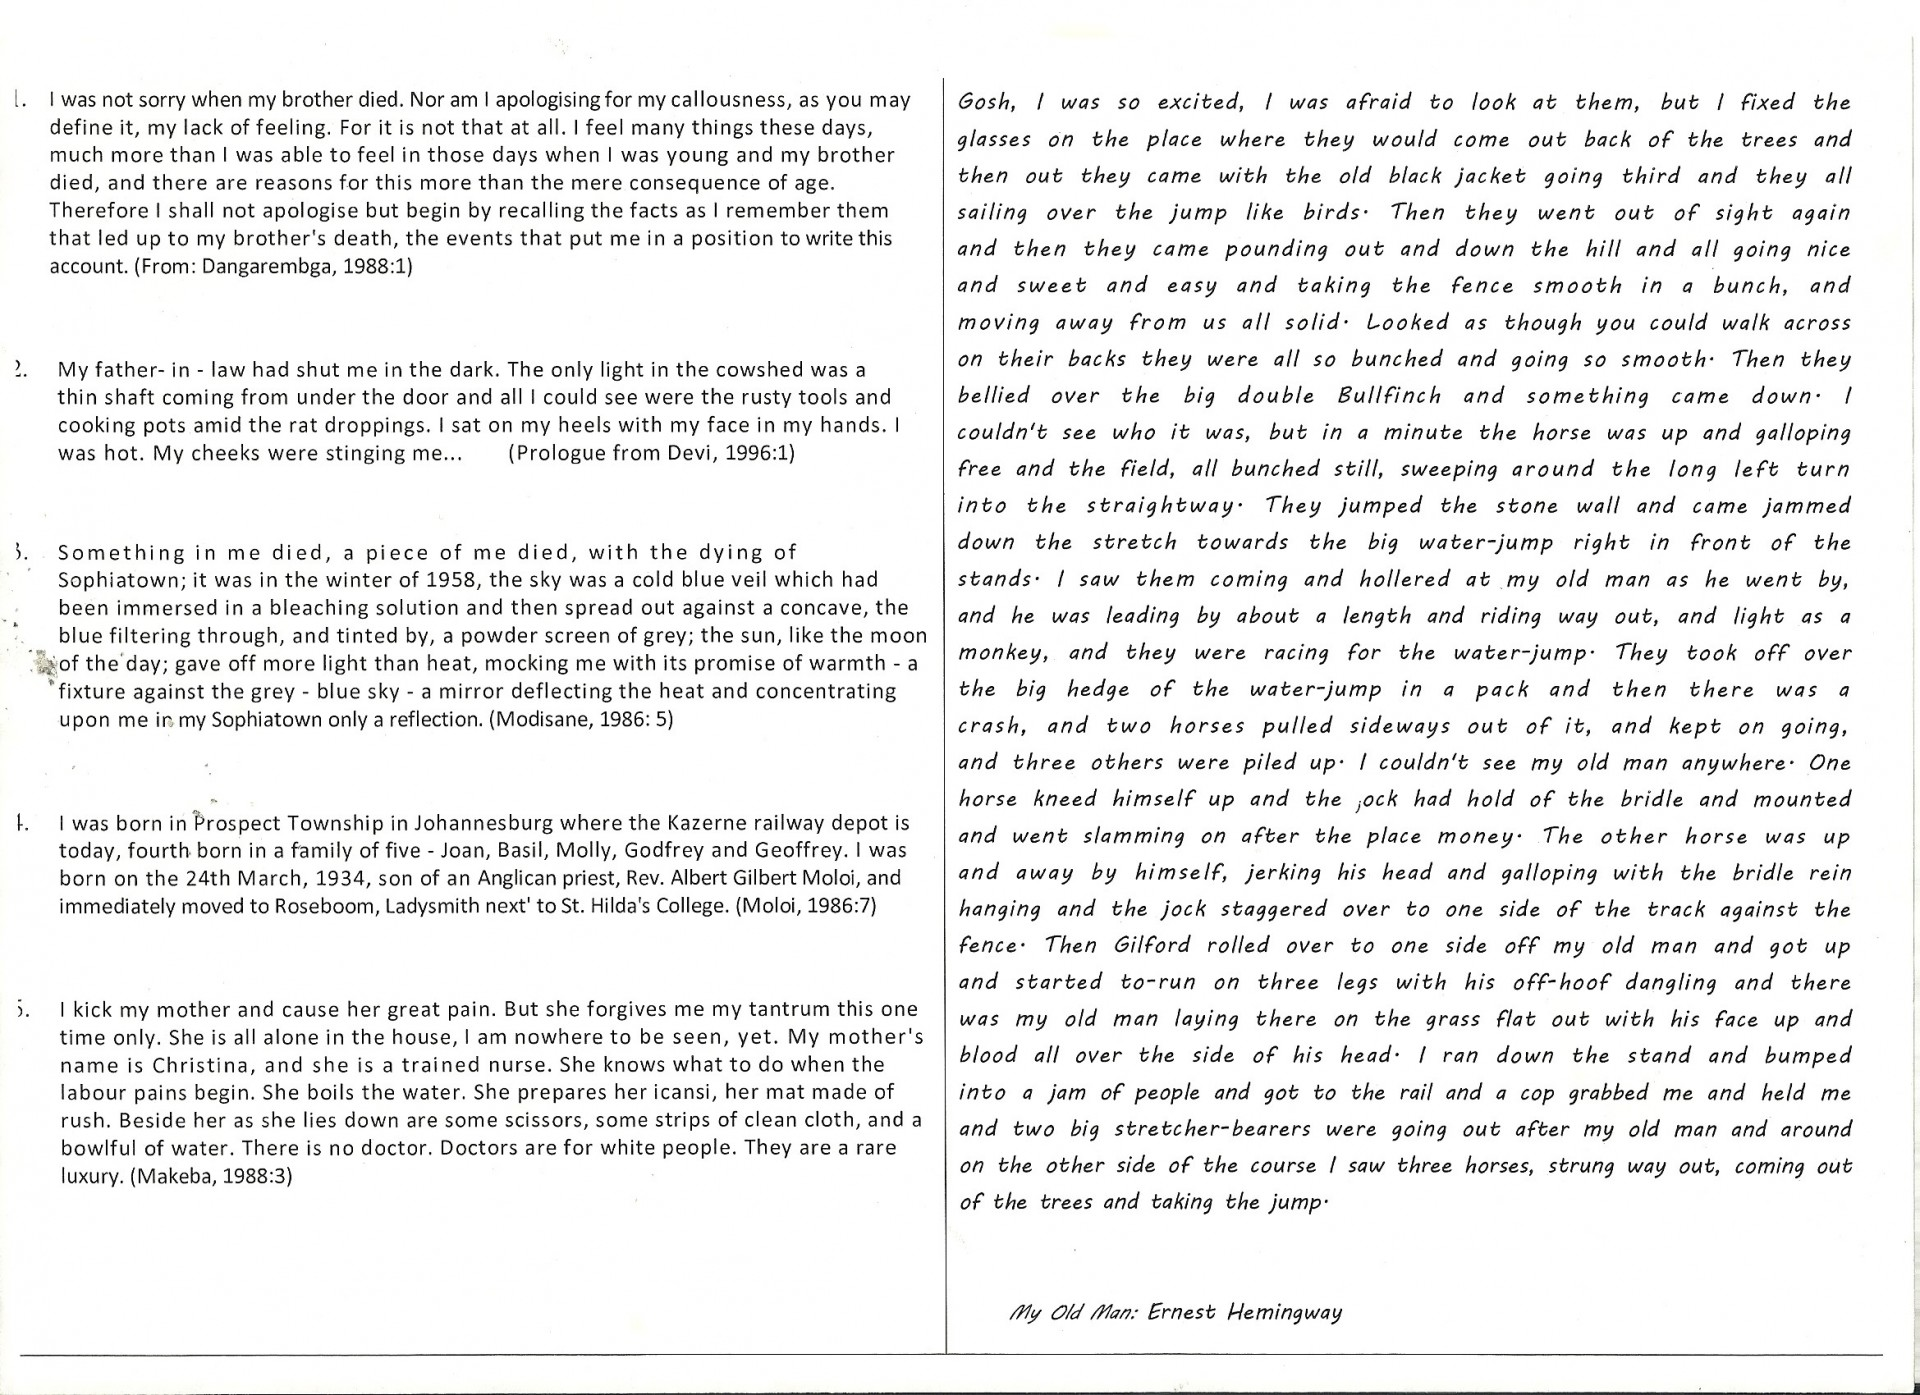 016 Ideas For Narrative Essay Example Good Vs Beautiful A Fictional Writing Personal Descriptive 1920